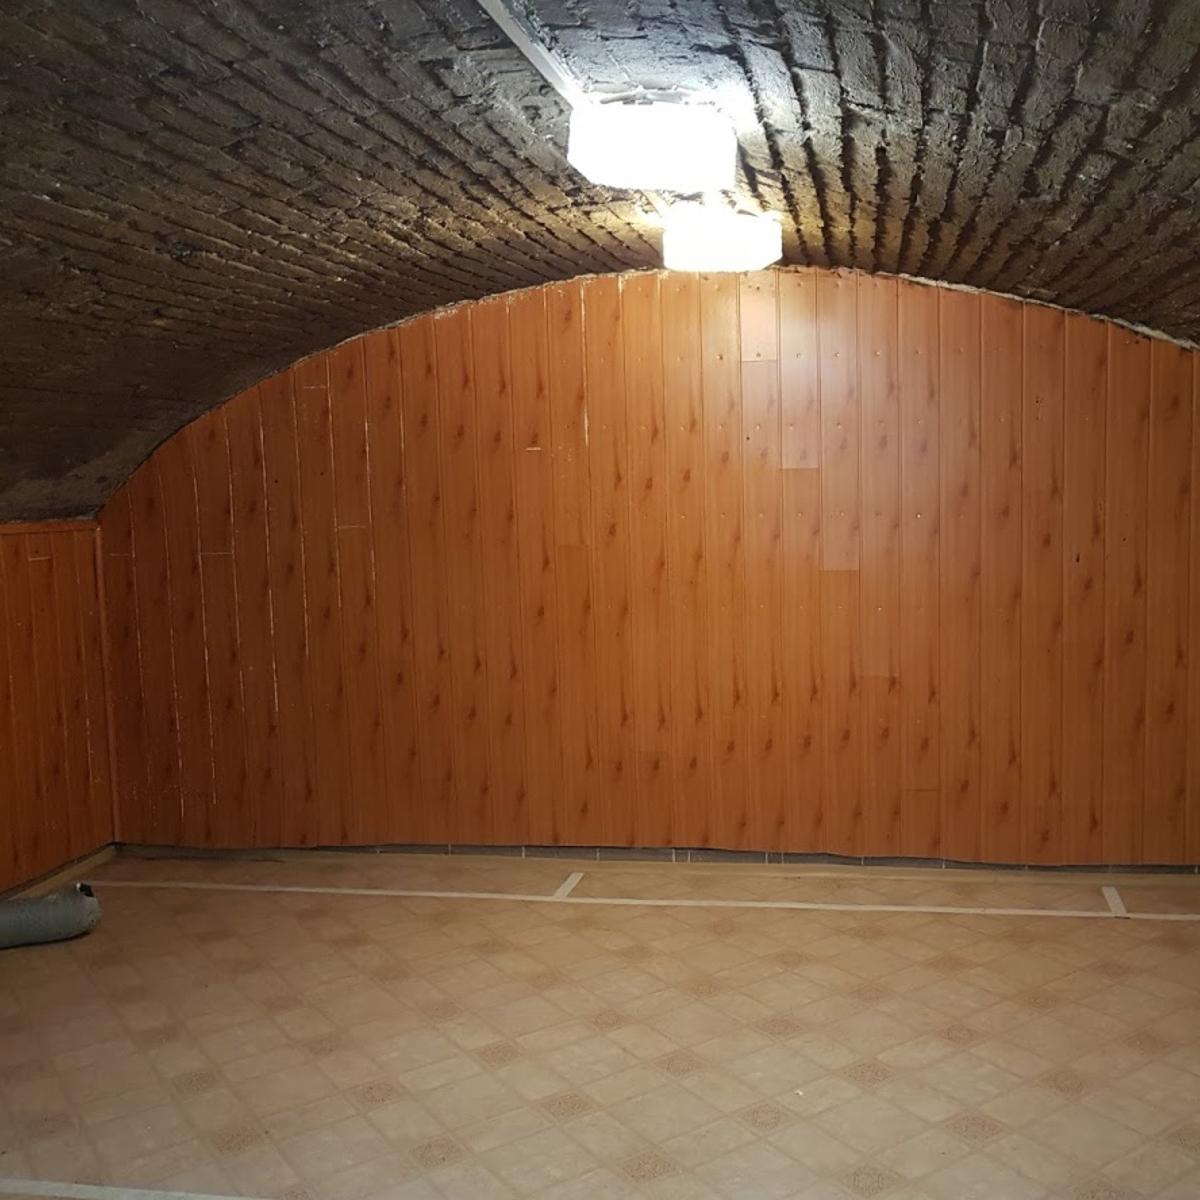 Eladó  ipari ingatlan (Budapest, VI. kerületBudapest, VI. kerület, Csengery u.) 19,9 M  Ft